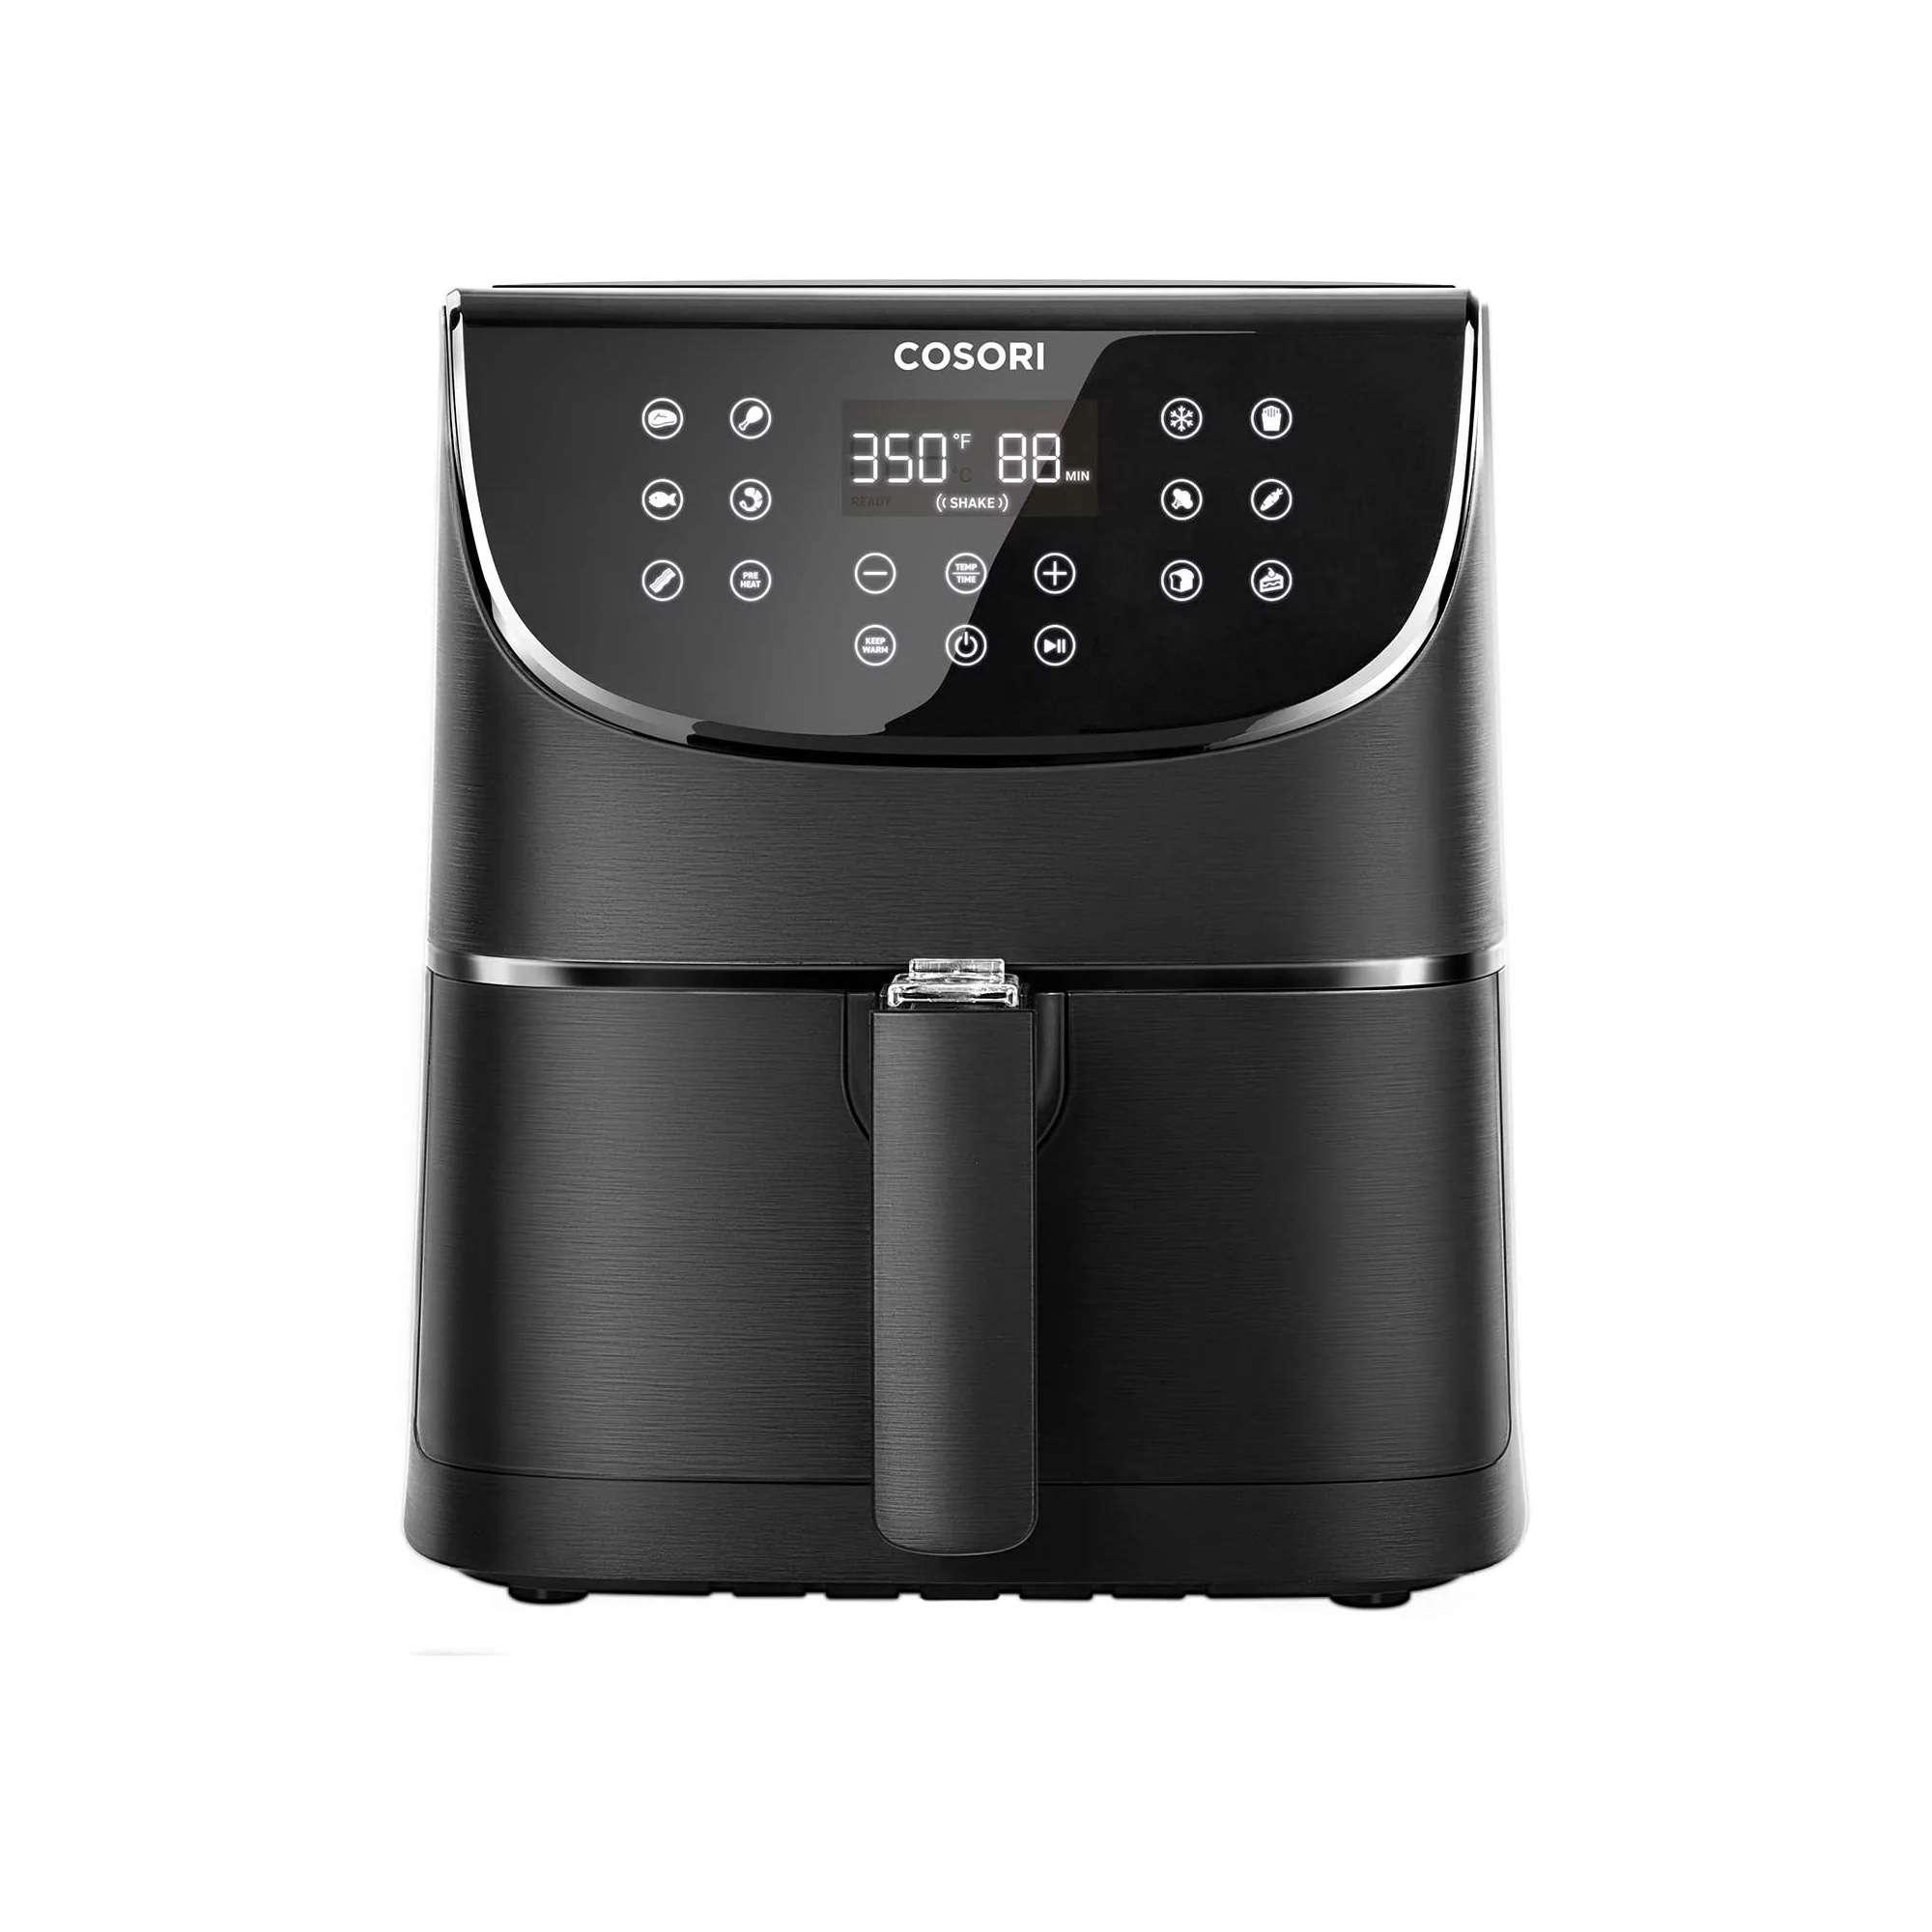 Cosori Pro Air Fryer CP158-AF